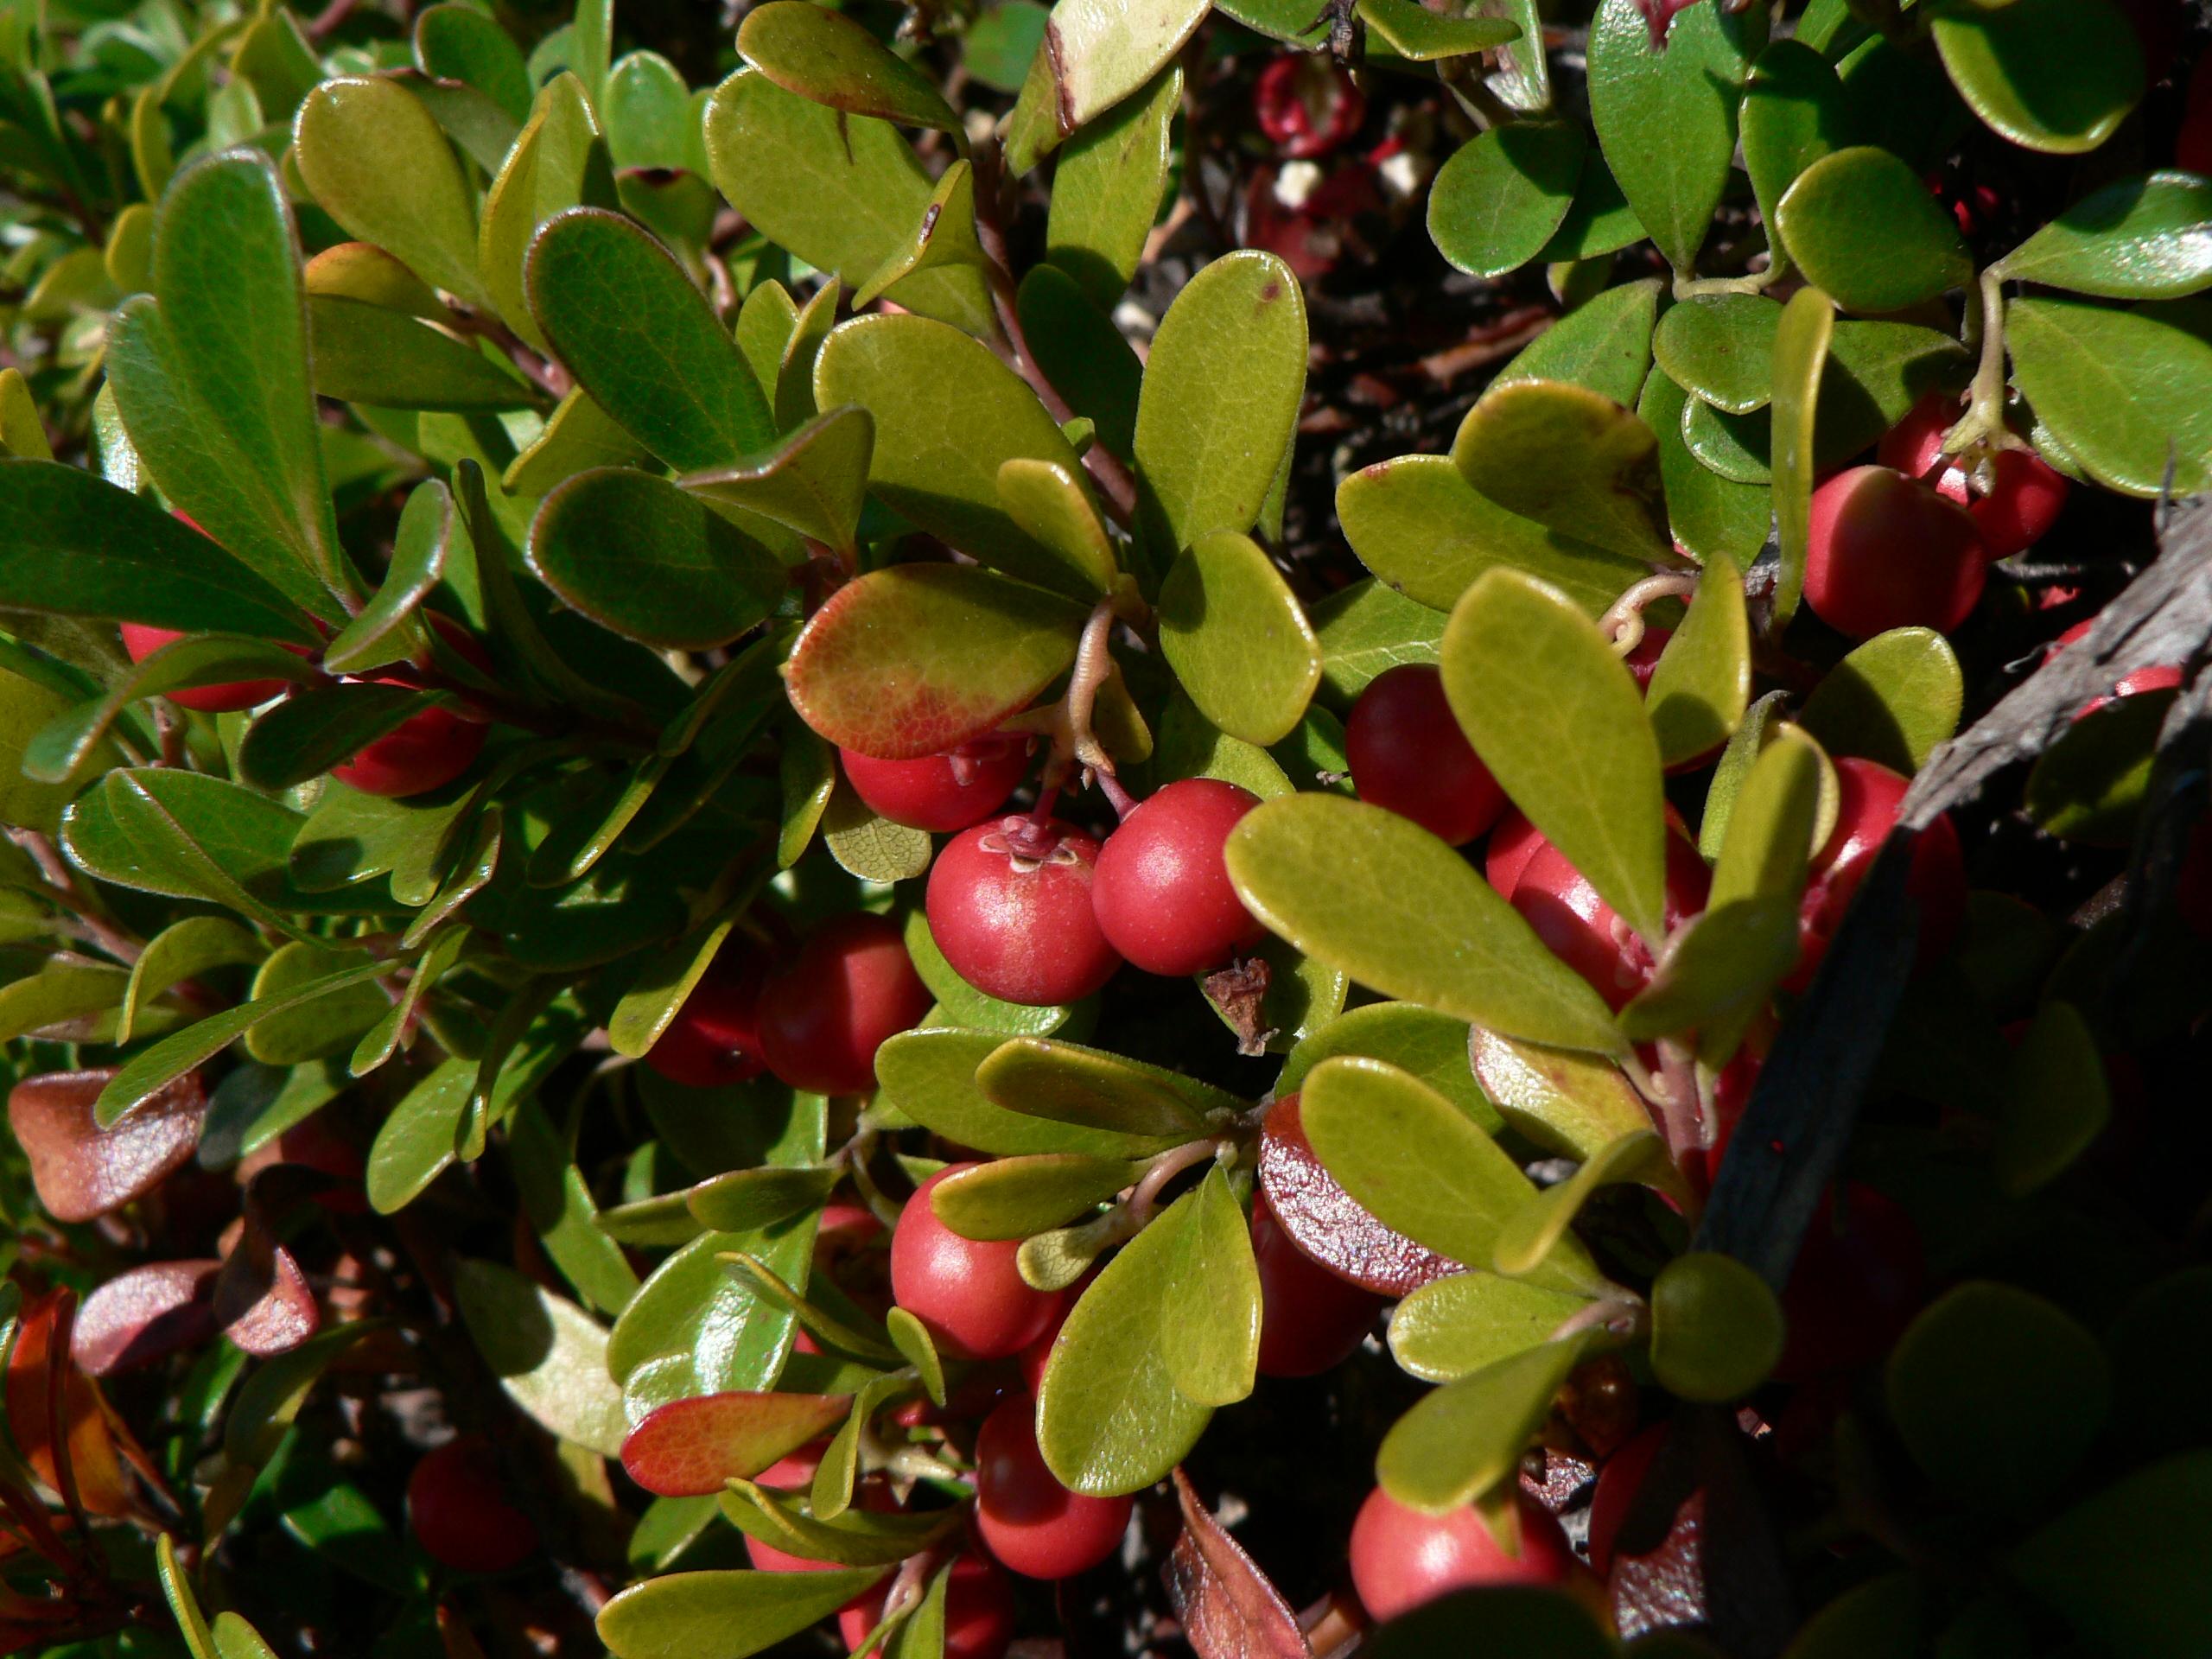 File:Arctostaphylos uva-ursi 25916.JPG - Wikimedia Commons